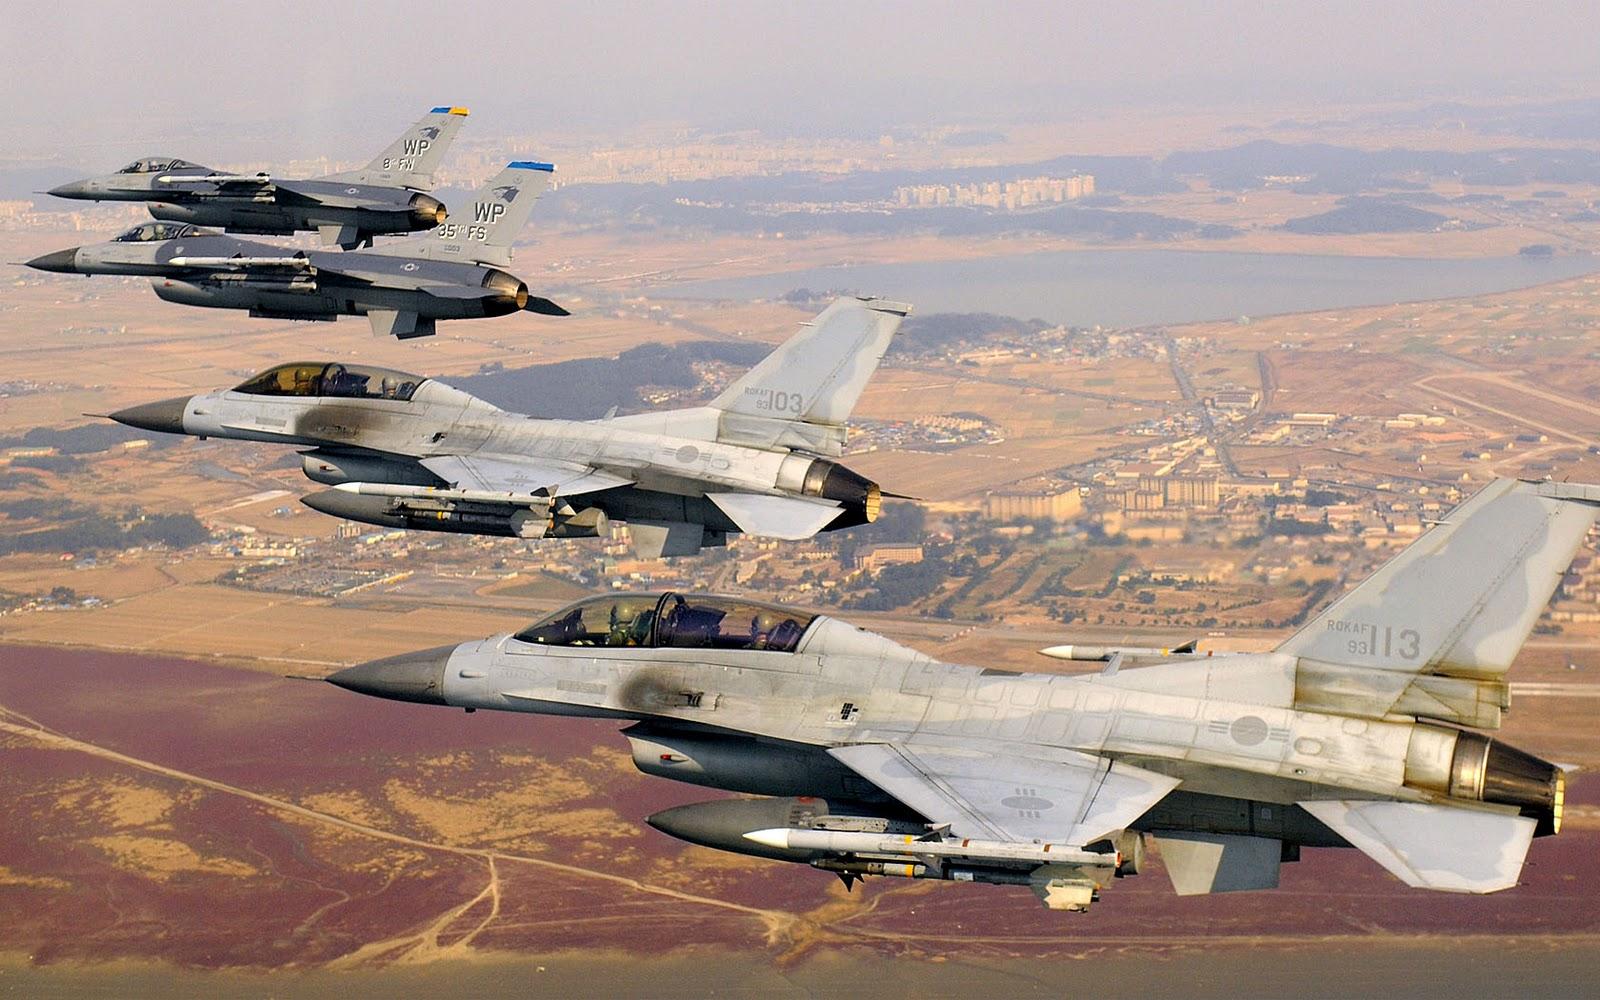 http://3.bp.blogspot.com/_8_4GnCTp578/TO2lt2fzvYI/AAAAAAAABZ0/4R16we9uRAw/s1600/USAF_SouthKorea_F-16.jpg